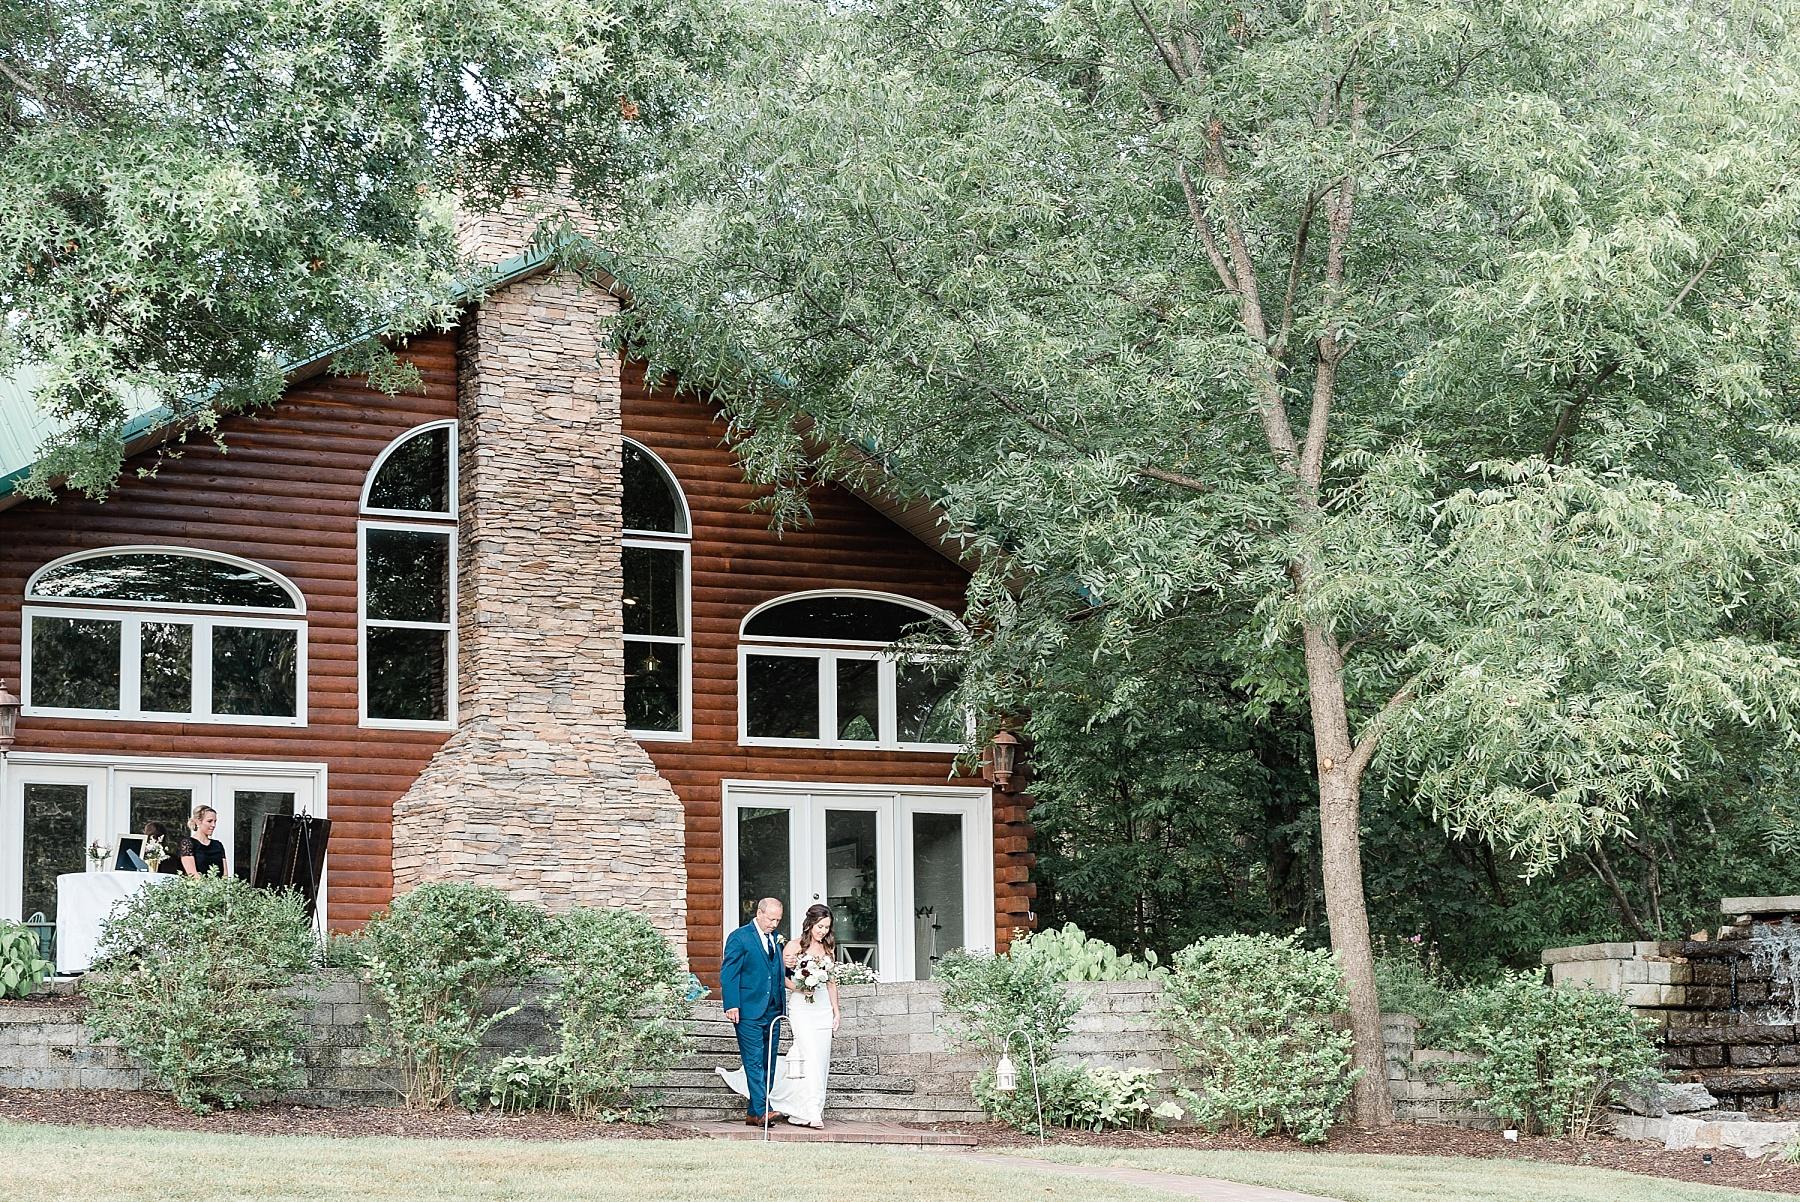 Romantic Summer Sunset Wedding Ceremony at Little Piney Lodge St. Louis Missouri by Kelsi Kliethermes Photography Fine Art Photographer_0007.jpg